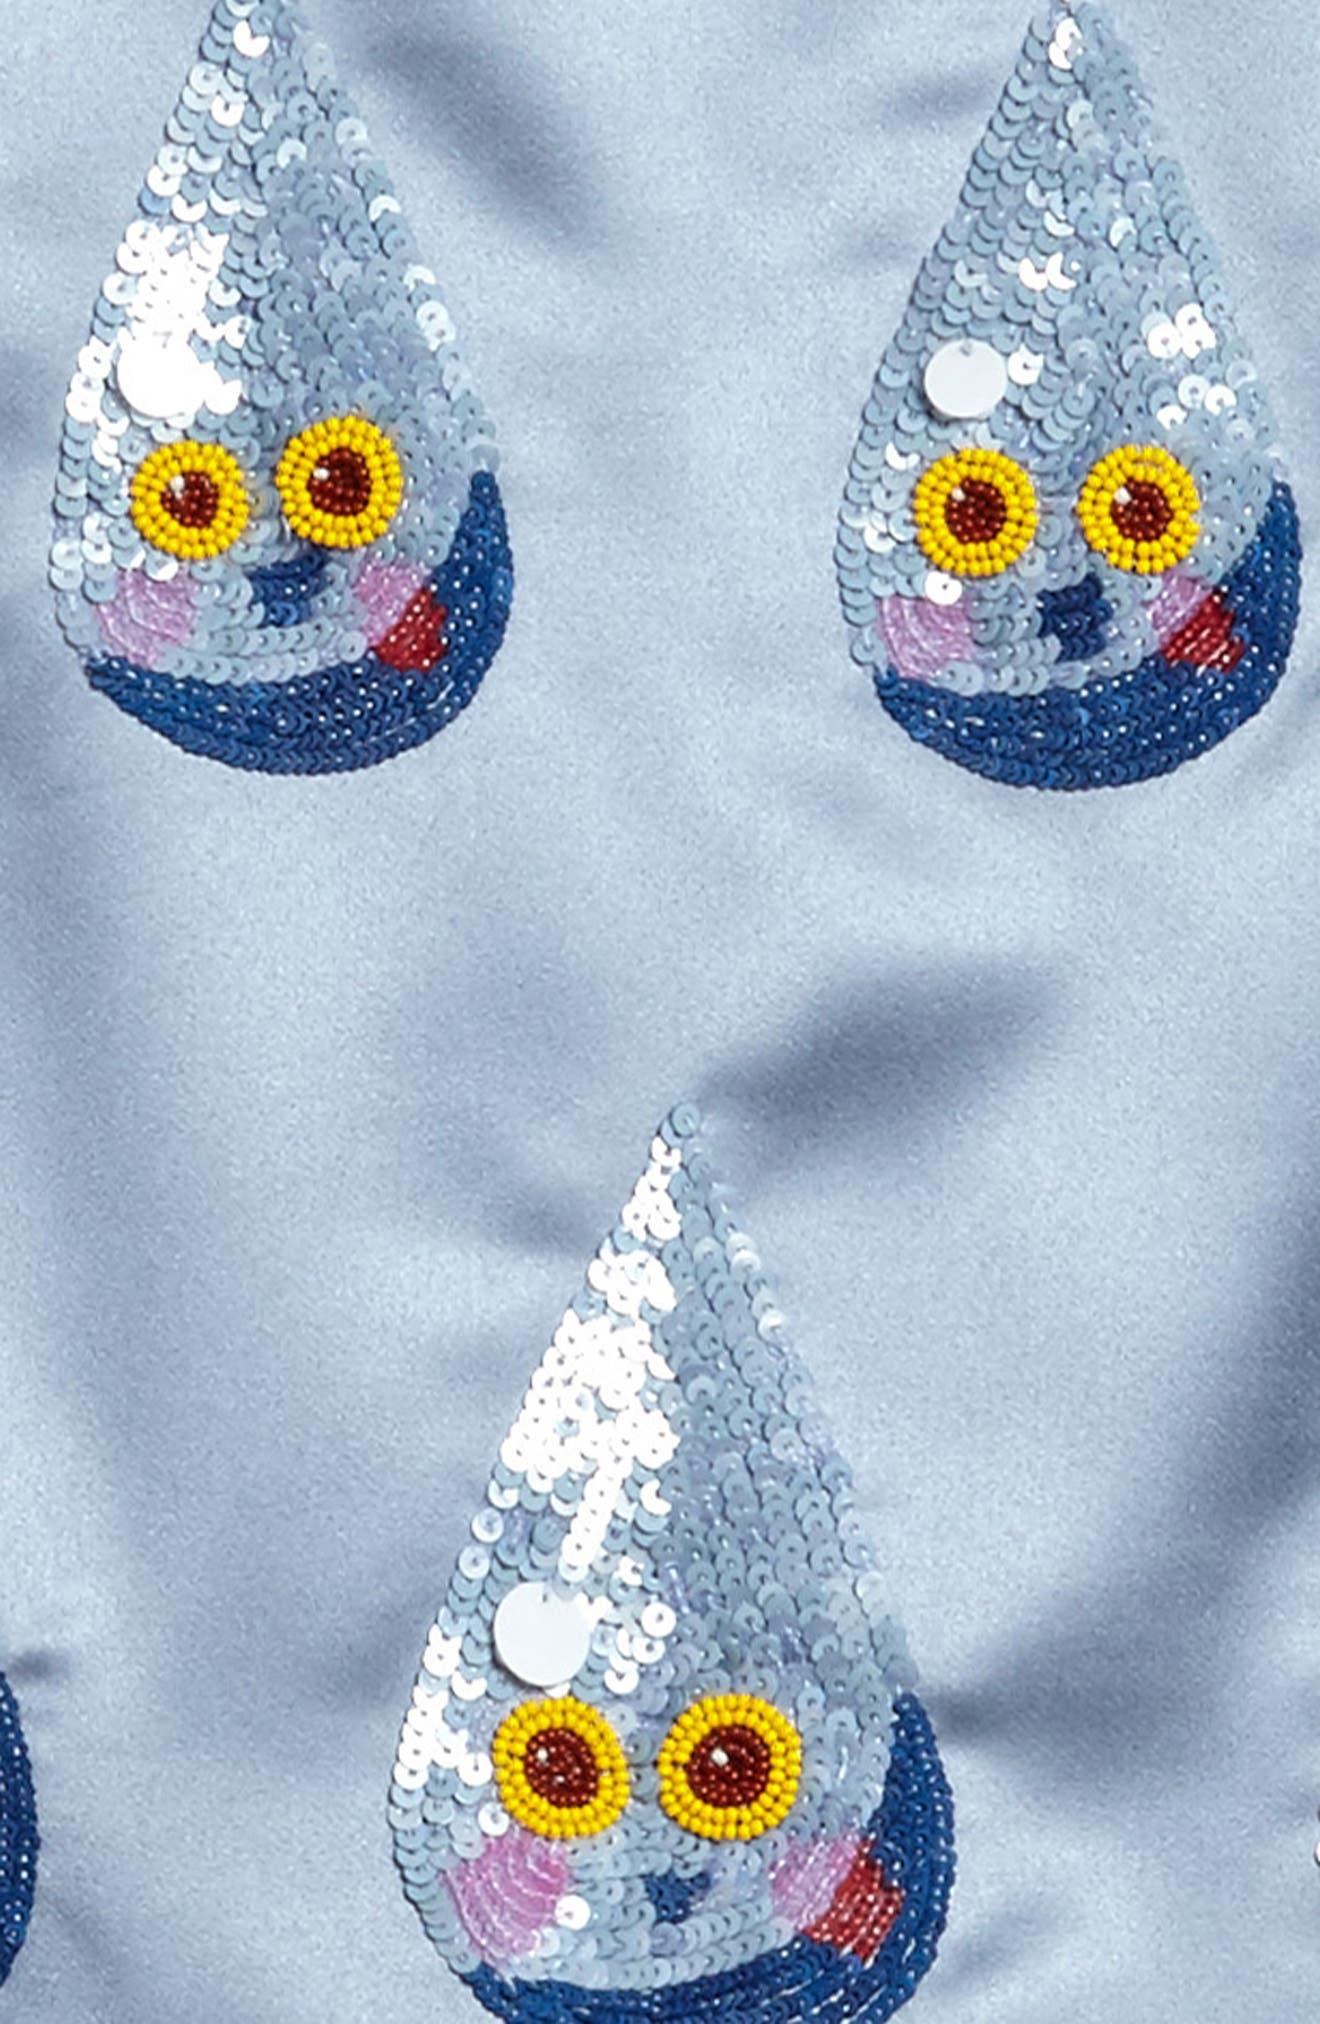 Sequin Raindrop Shift Dress,                             Alternate thumbnail 3, color,                             400